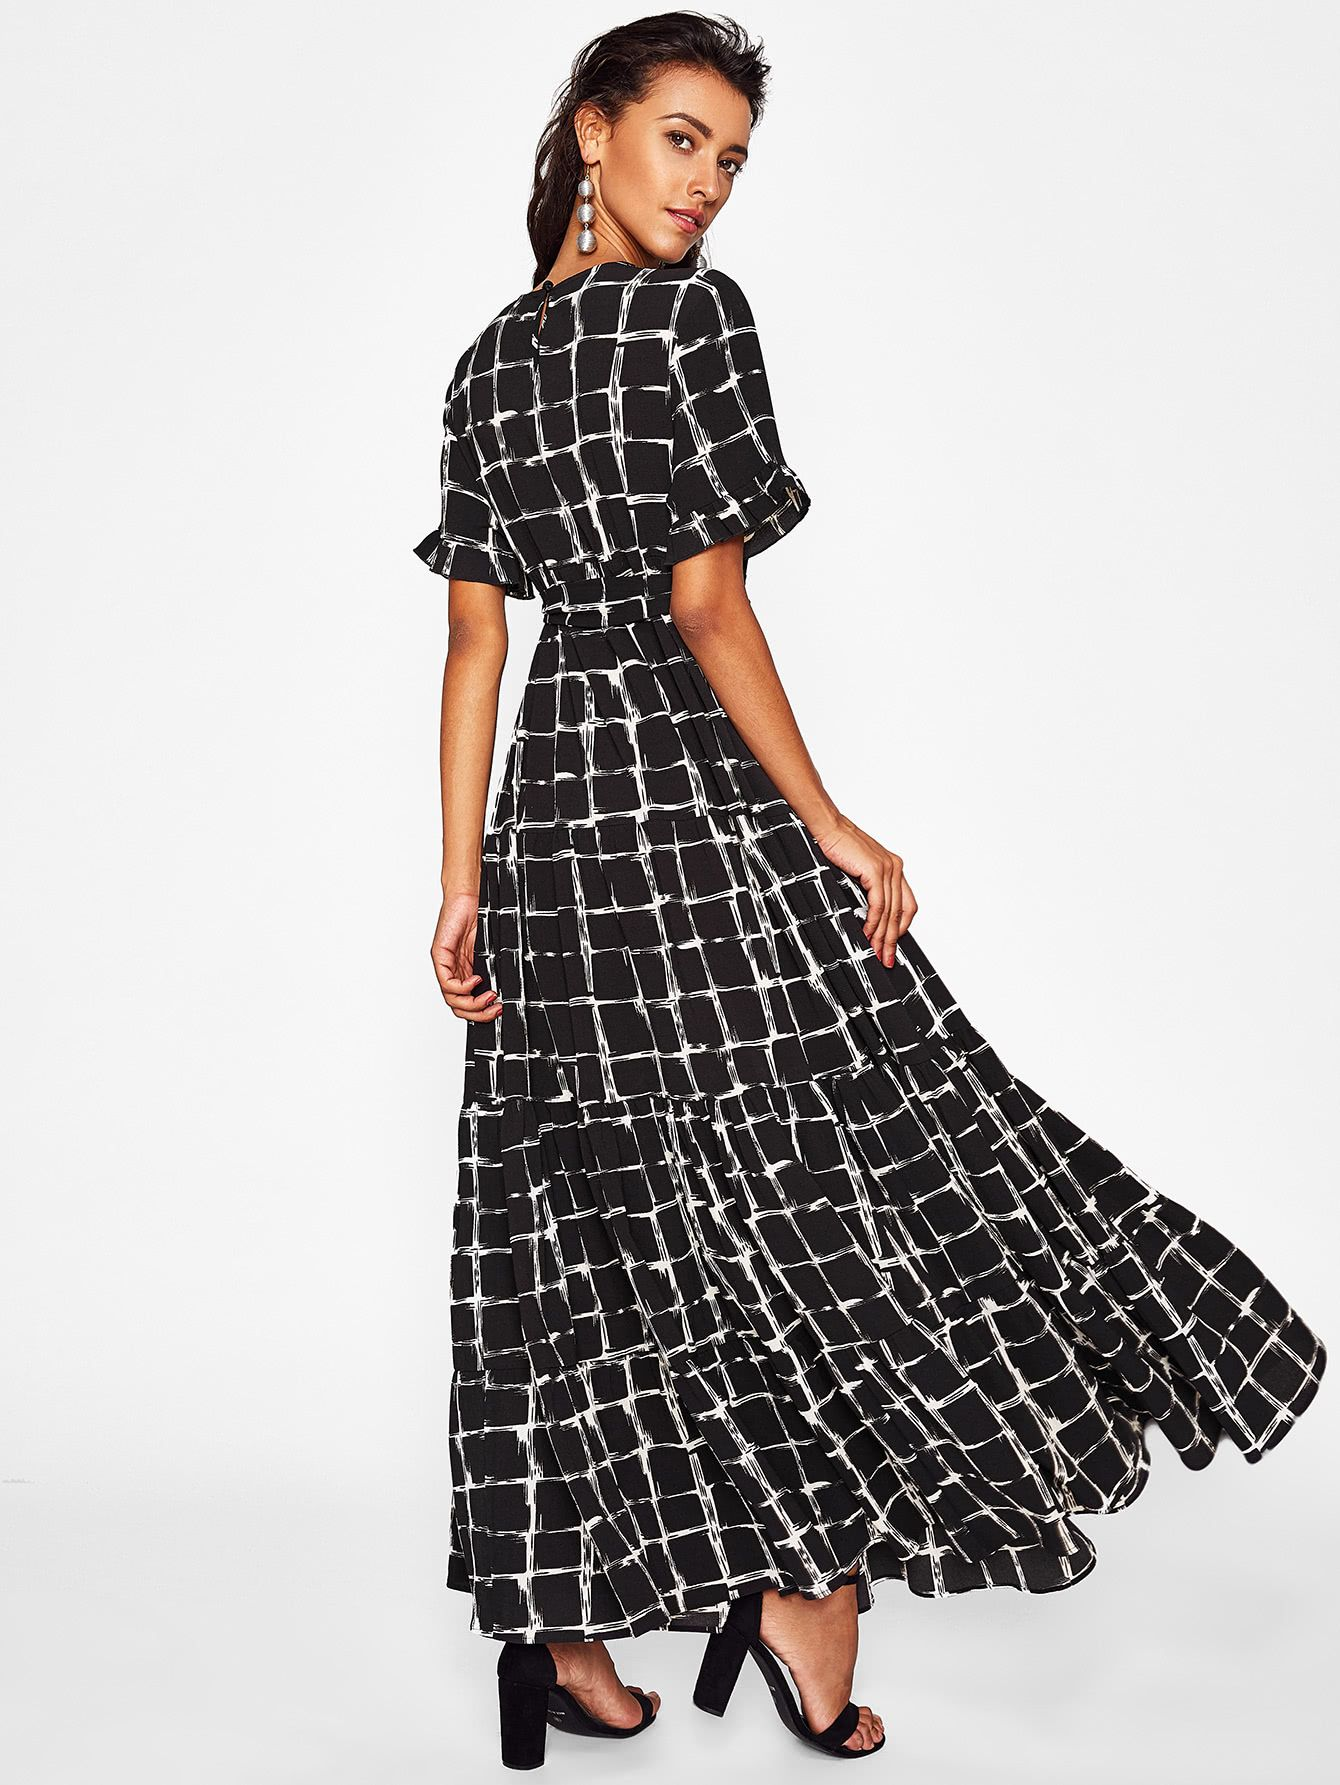 c22cbbad4e57 Frilled Sleeve Brush Stroke Grid Tiered Dress -SheIn(Sheinside) | My ...